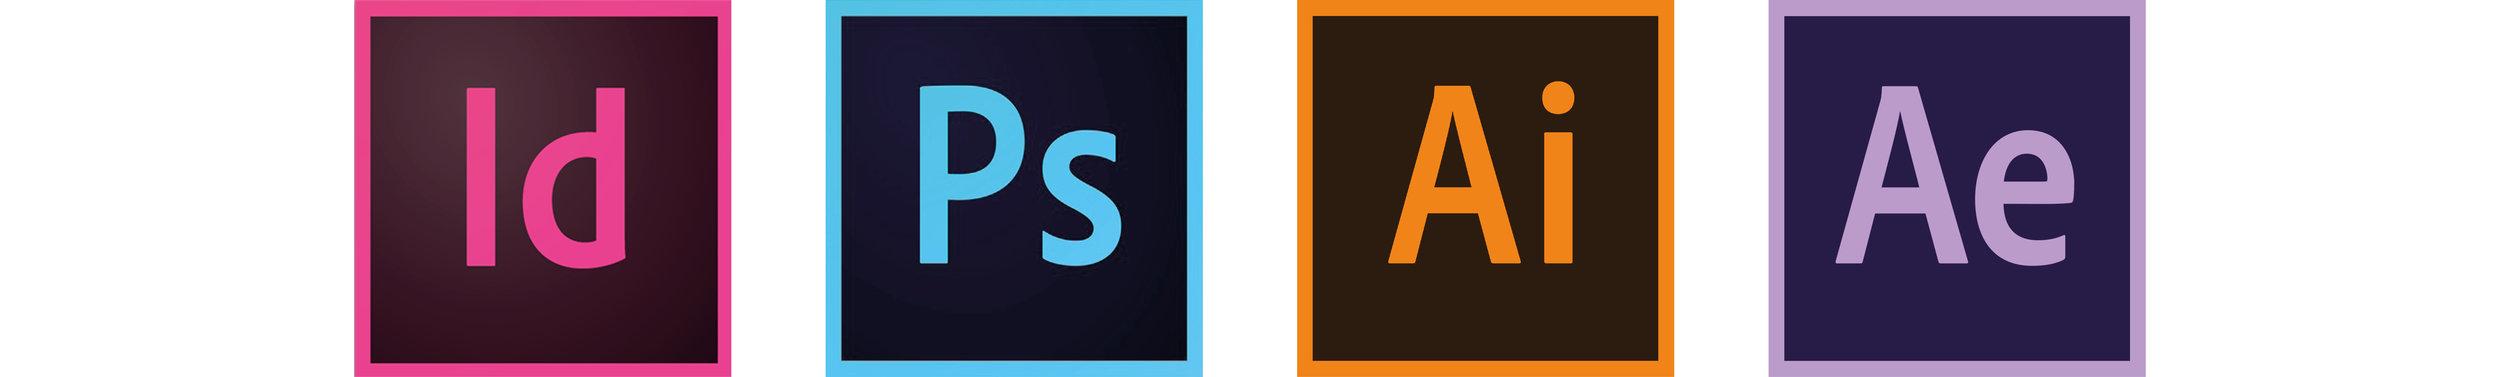 Adobe Creative Cloud Cluster.jpg